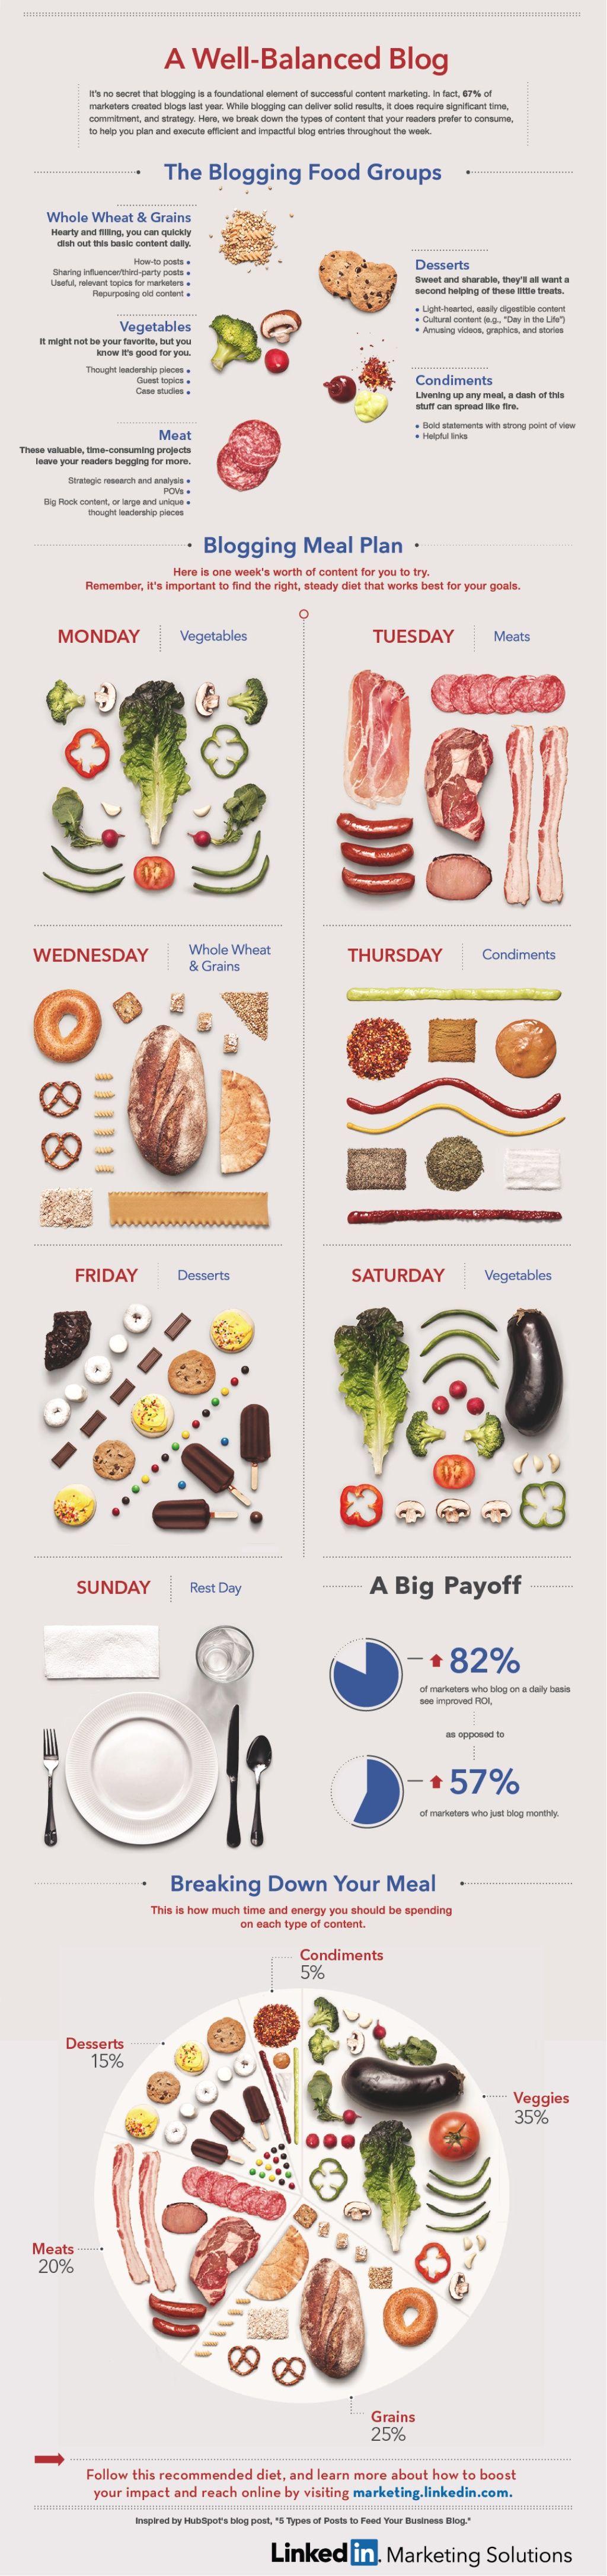 What Does A Well-Balanced Content Diet Look Like?  http://www.socialfresh.com/the-blogging-food-groups-a-well-balanced-diet-of-content-infographic/?utm_content=buffer1fc23&utm_medium=social&utm_source=pinterest.com&utm_campaign=buffer http://socialfresh.com/wp-content/uploads/2014/02/well-balanced-blog.jpg?utm_content=buffer403cb&utm_medium=social&utm_source=pinterest.com&utm_campaign=buffer  #wombizclub